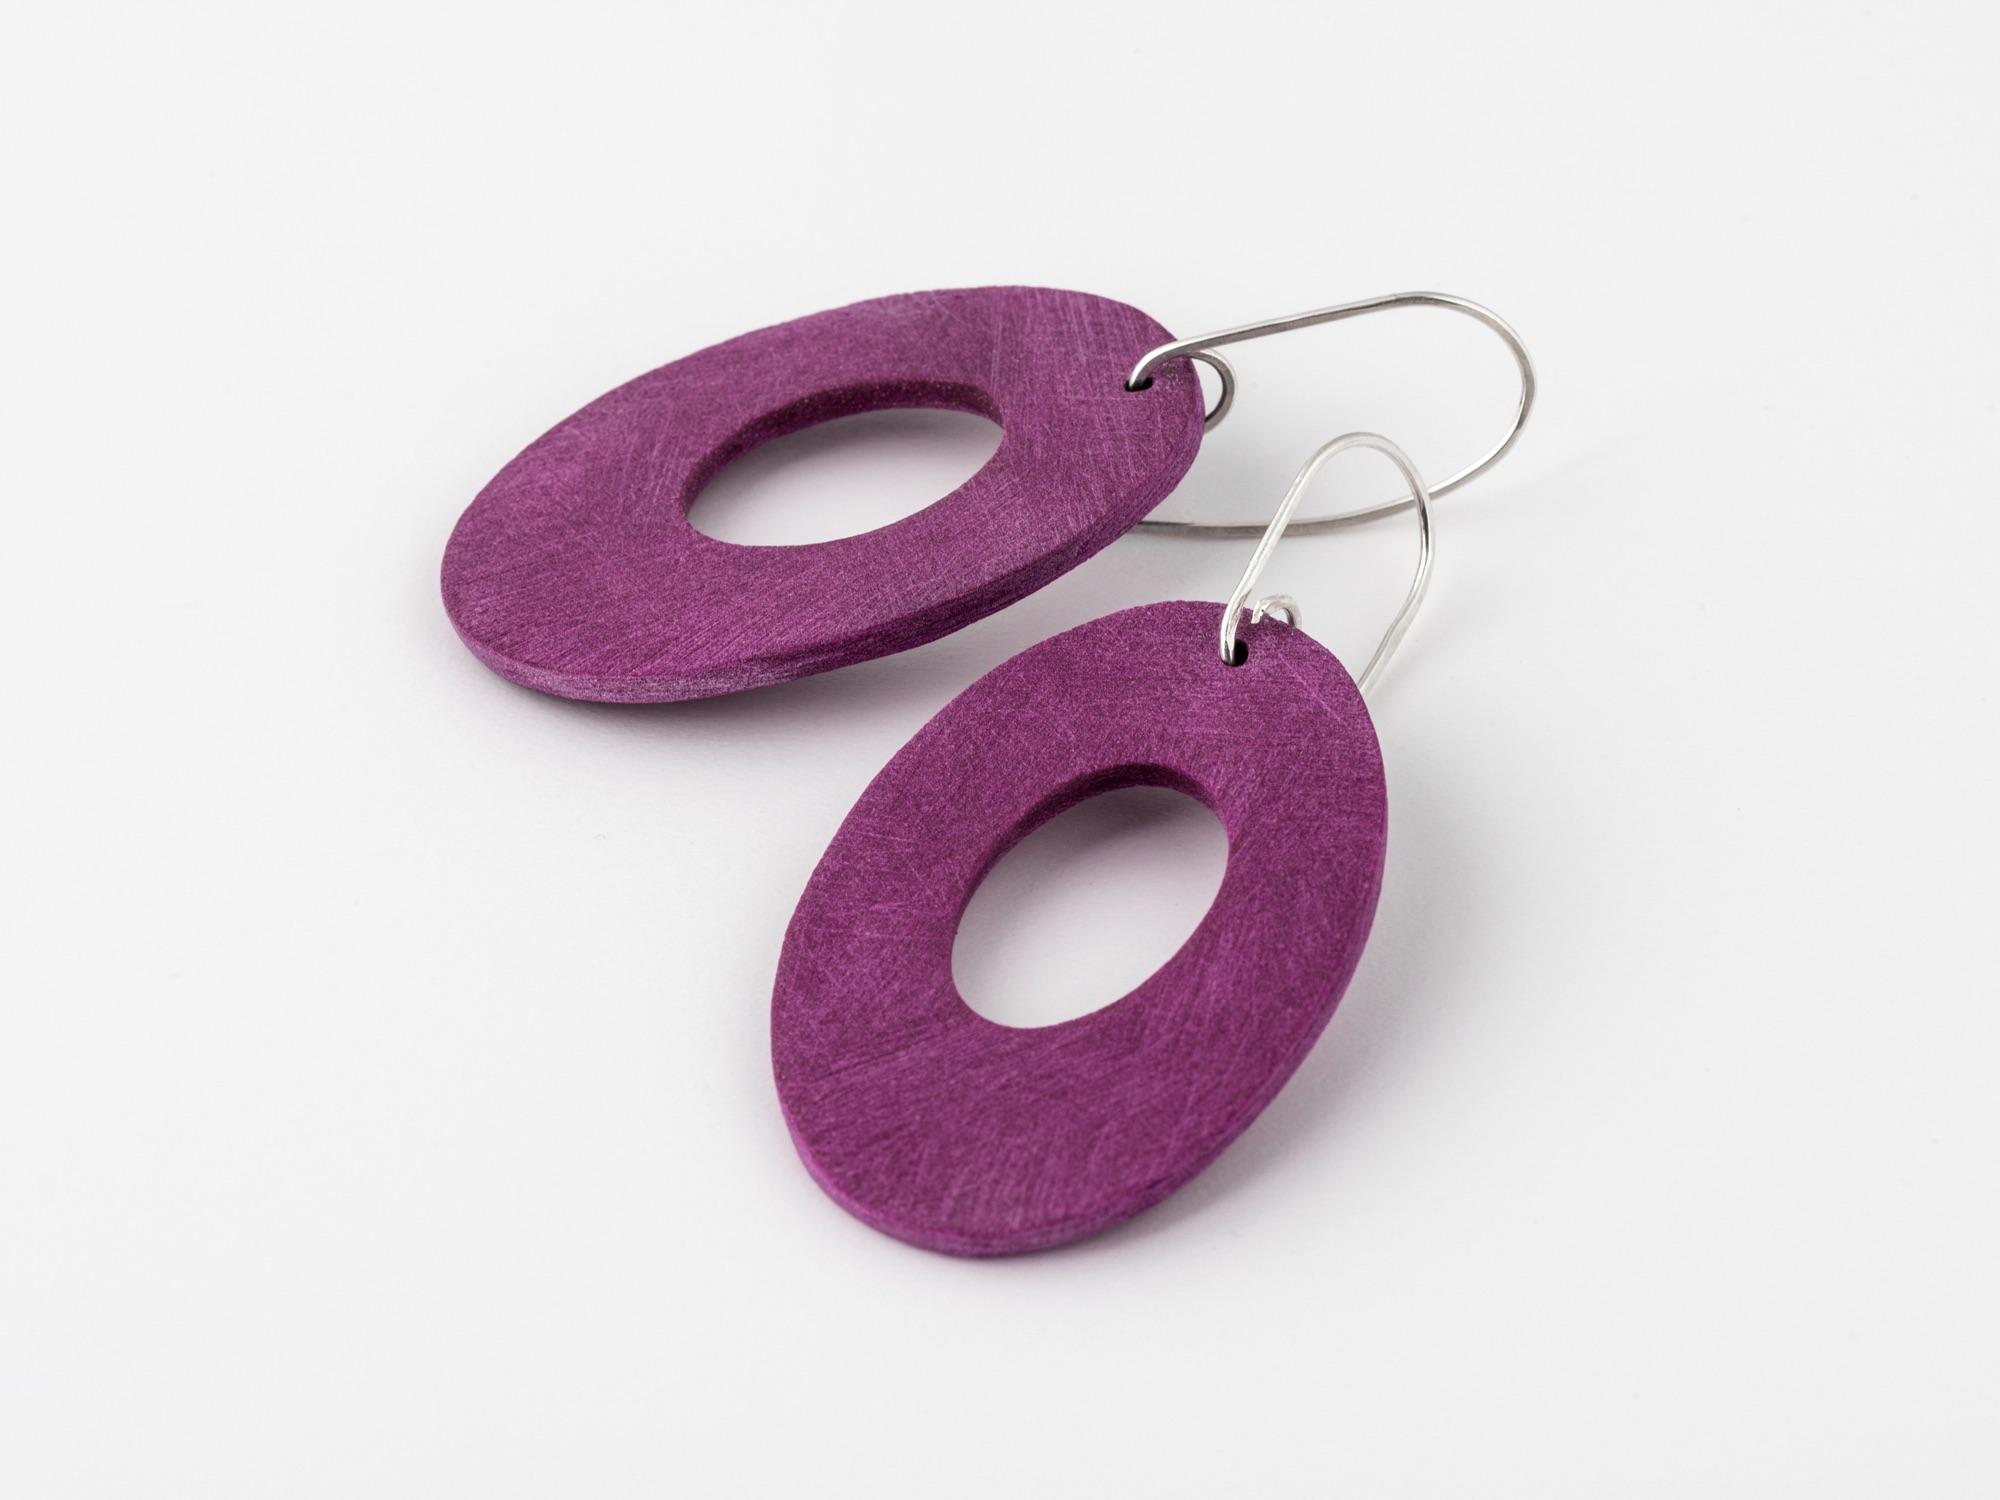 dark pink statement oval earrings by Clare Lloyd